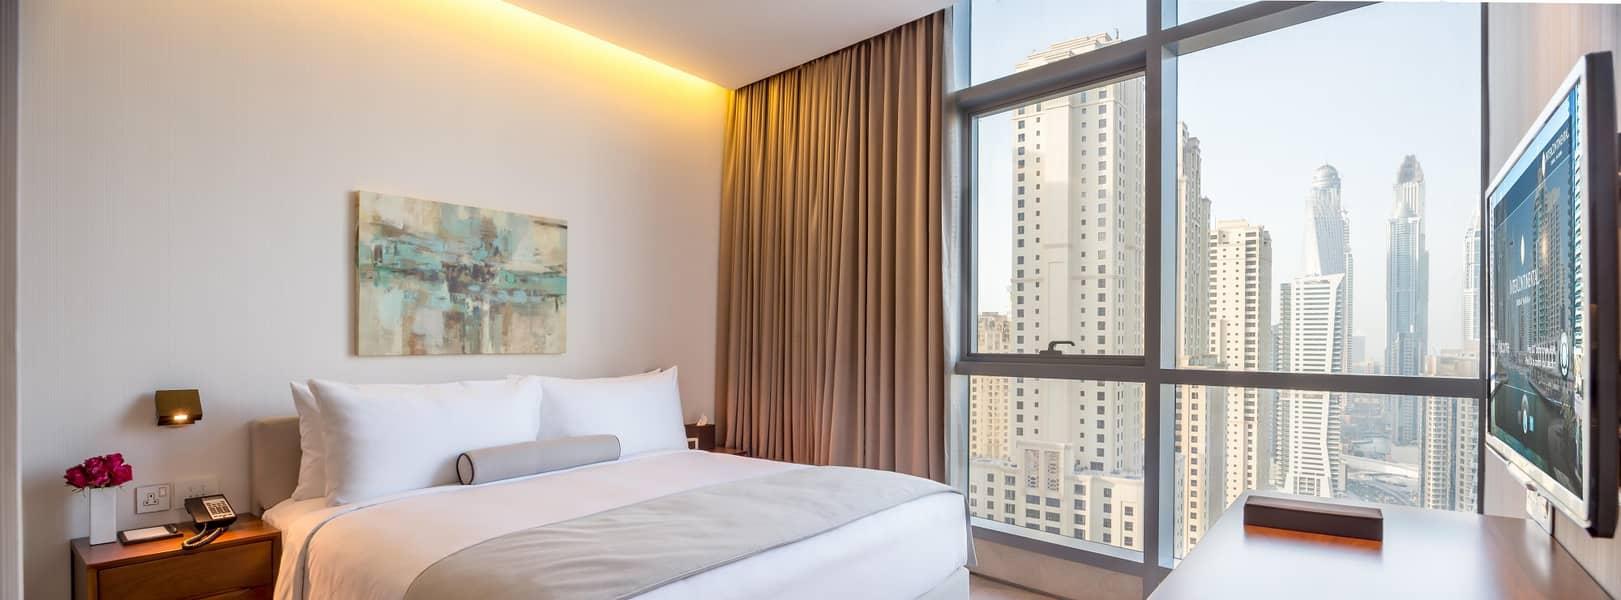 Spacious JBR/Marina View Apartment - Fully Serviced